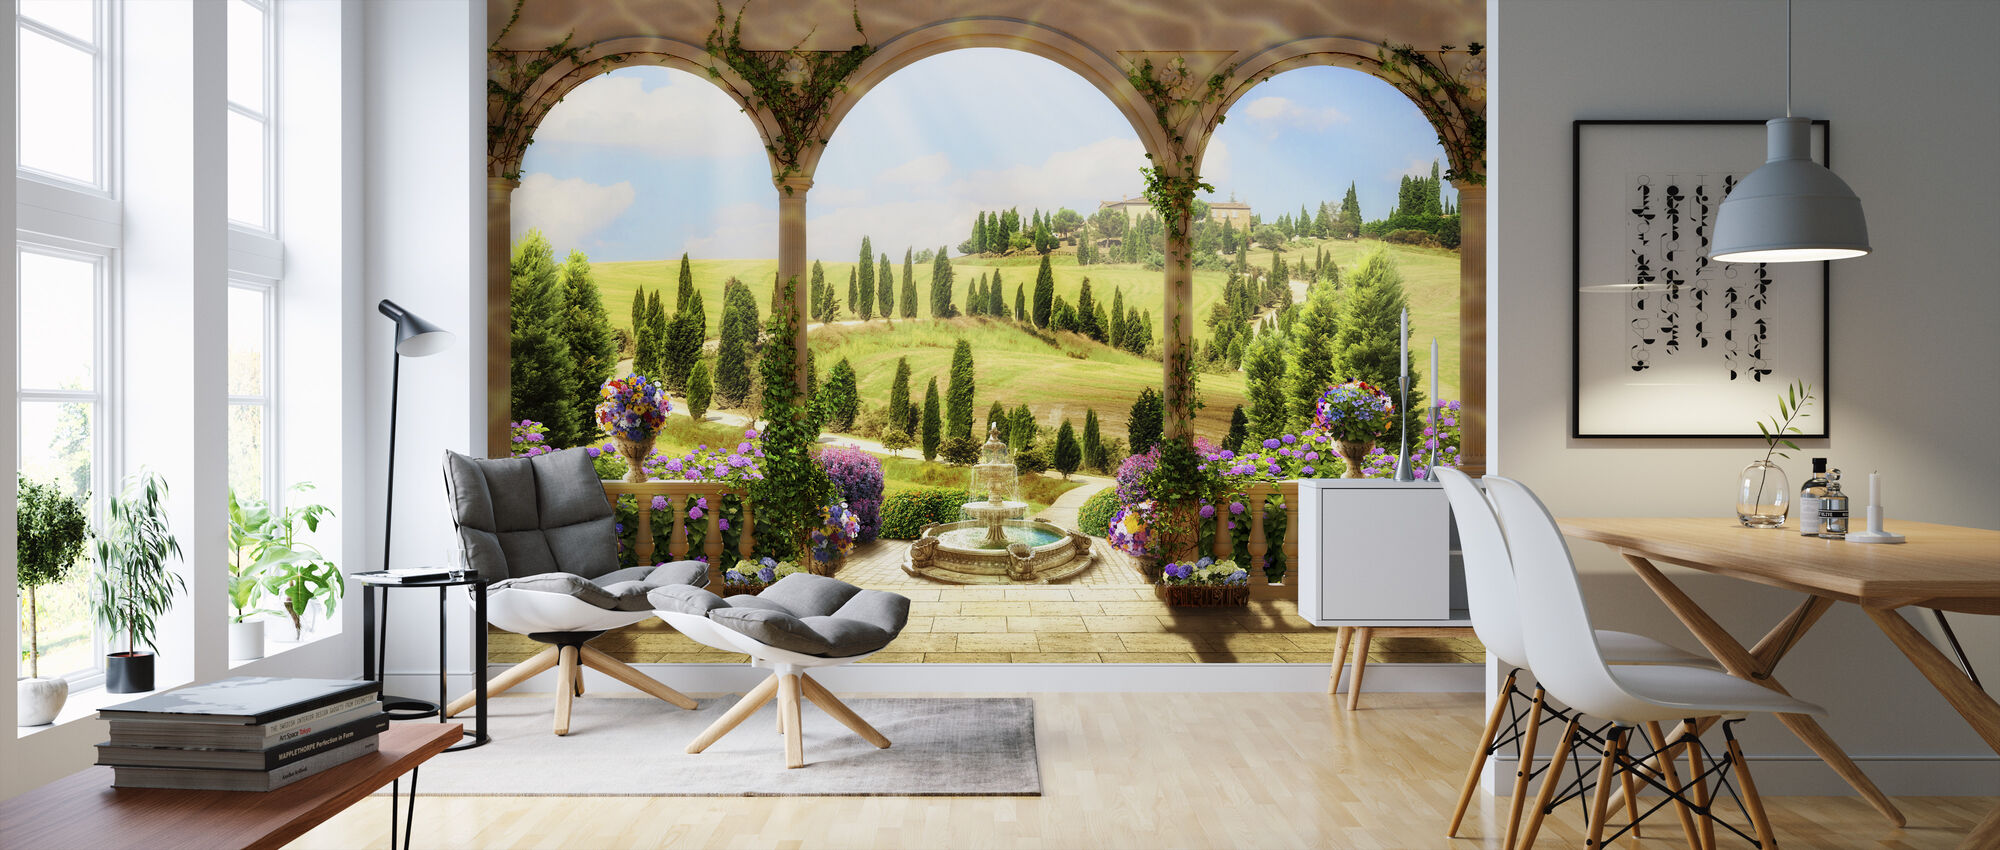 Lovely Countryside Road - Wallpaper - Living Room